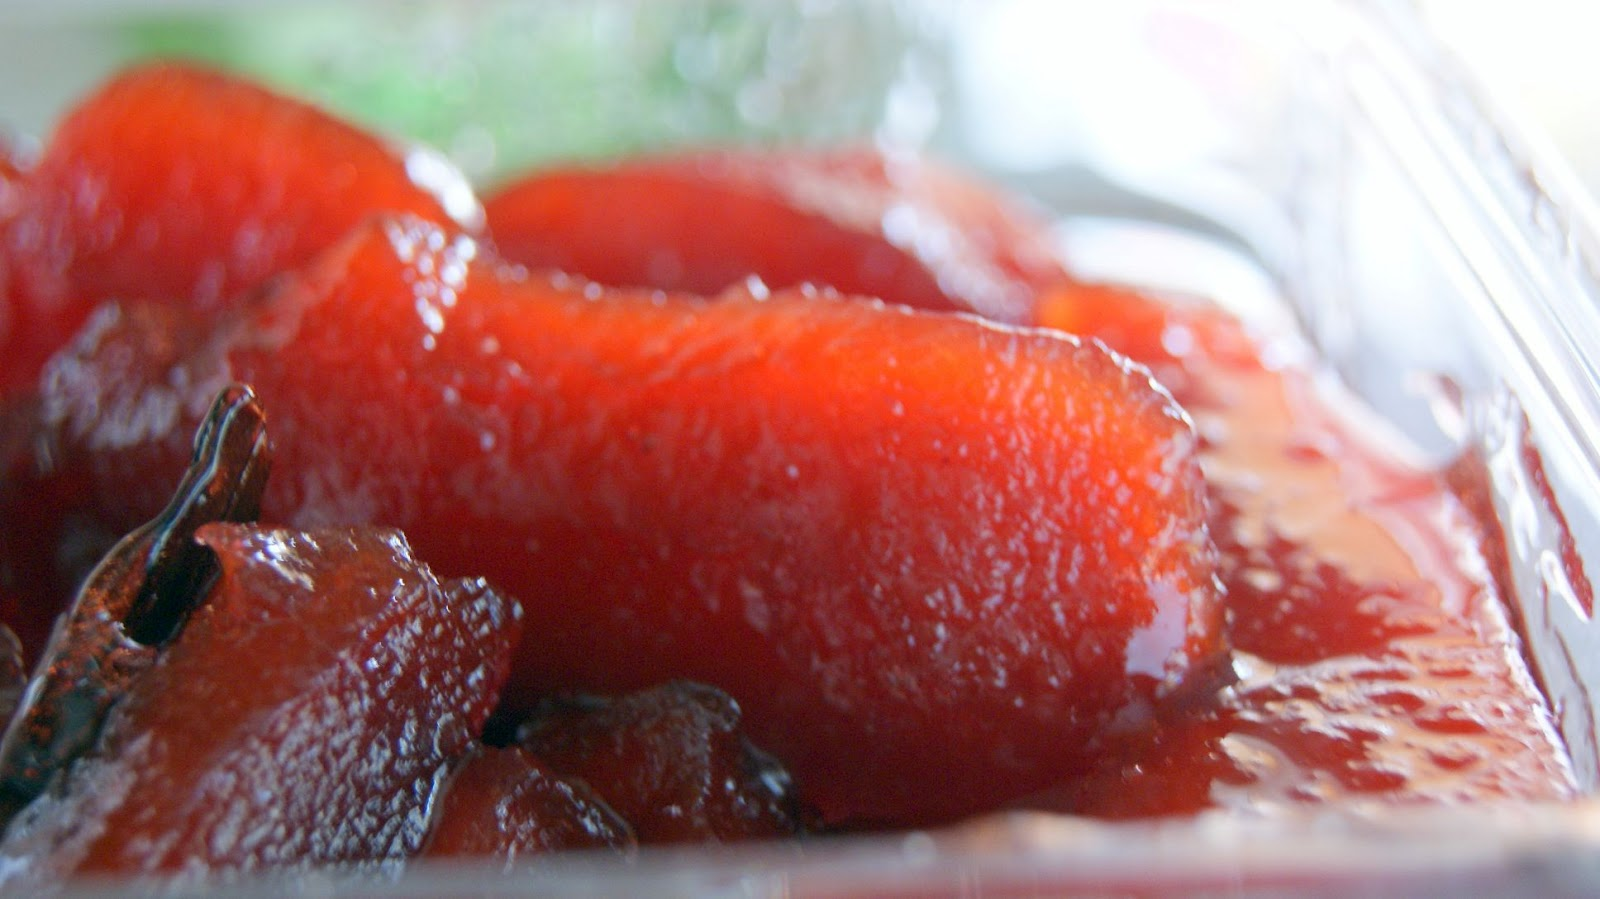 Quince jam/preserve